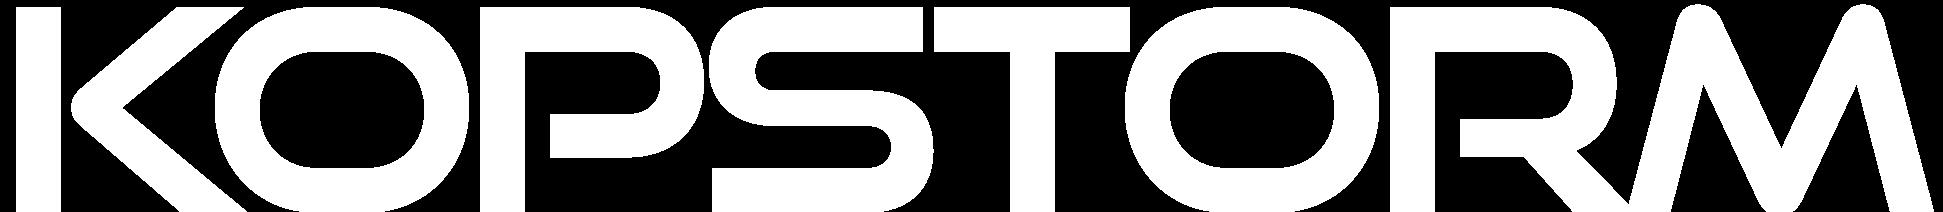 Kopstorm Comm.V logo